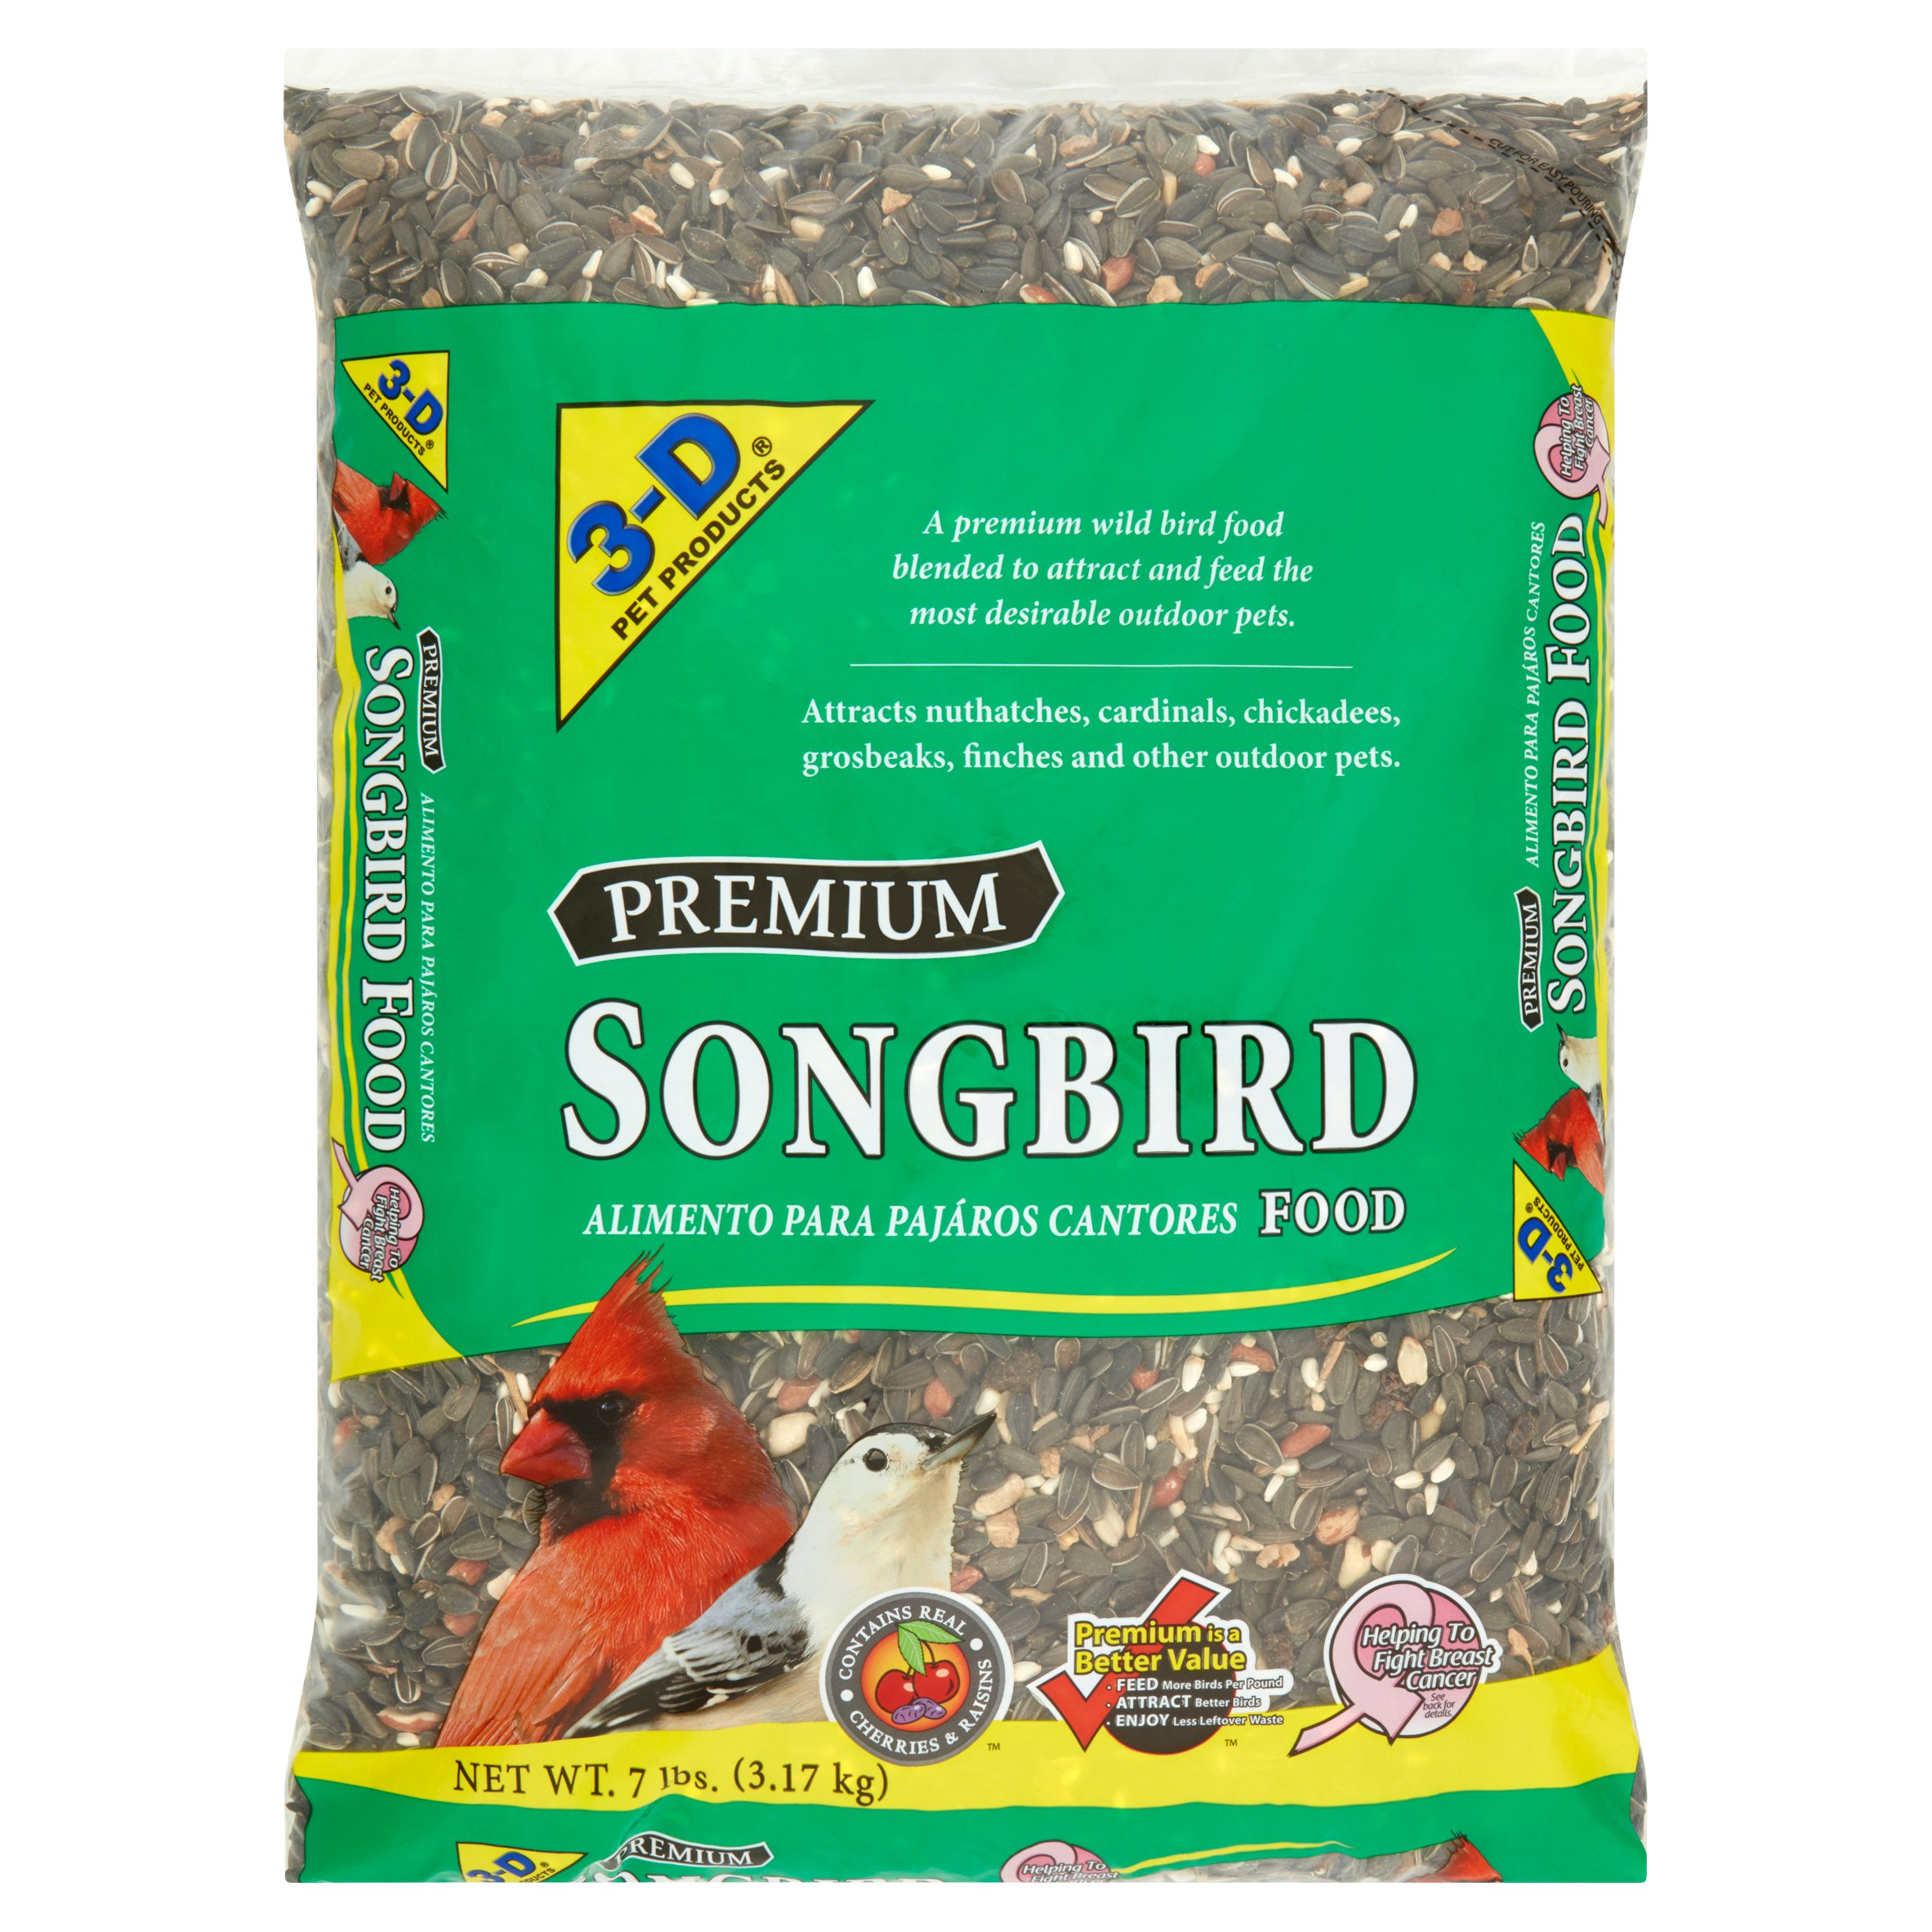 3-D Pet Products Premium Songbird Food Dry Bird Food, 7 LB by D & D Commodities Ltd.